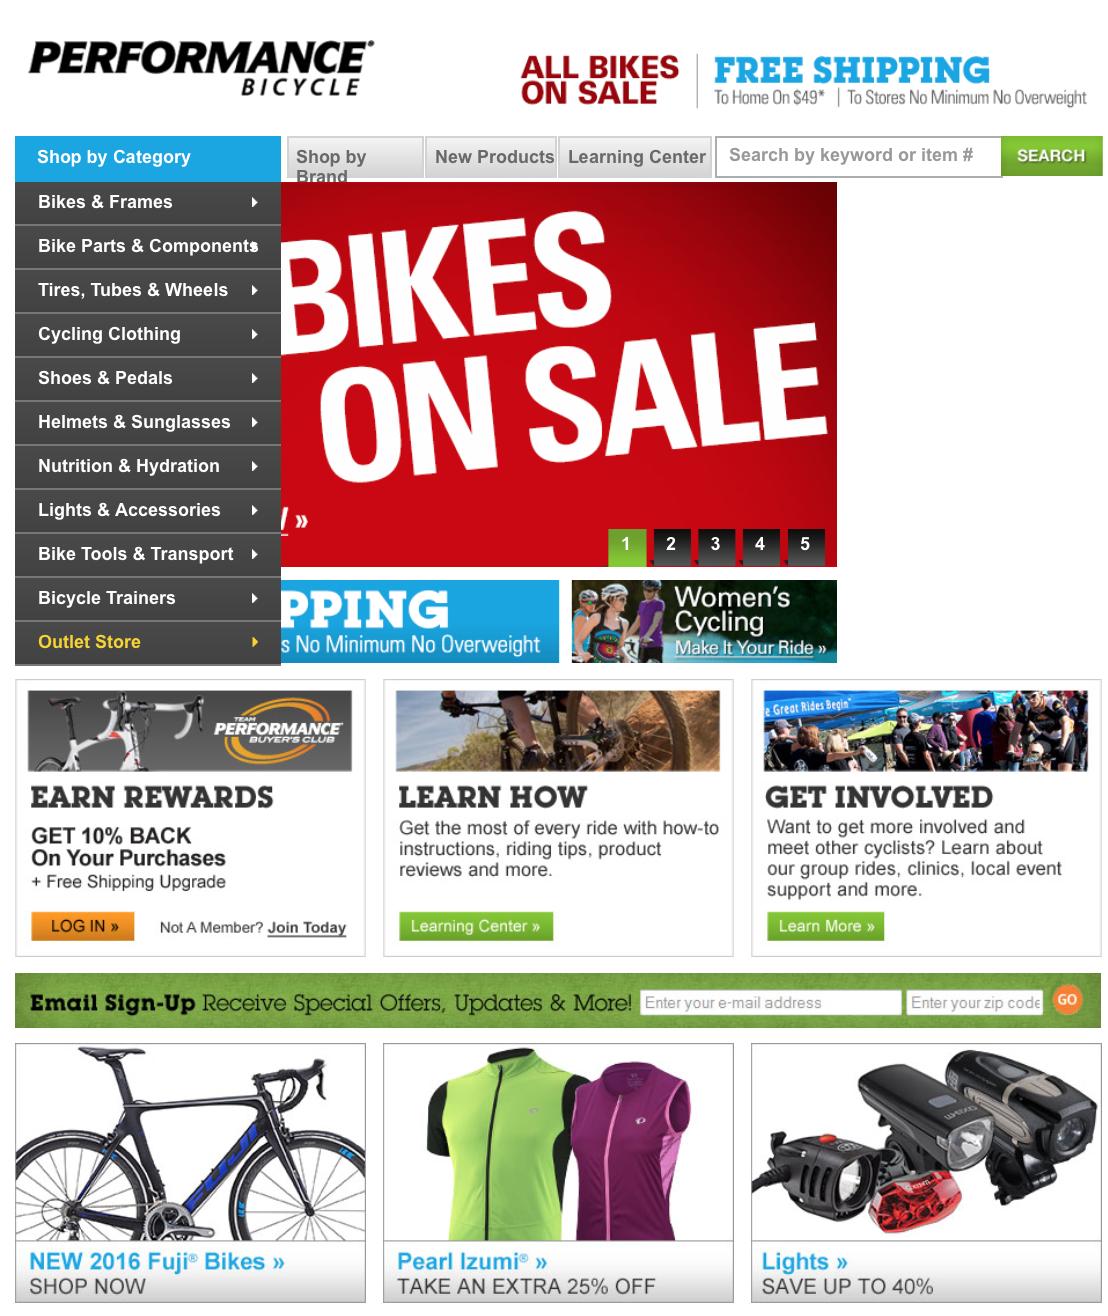 Performance bike coupon code